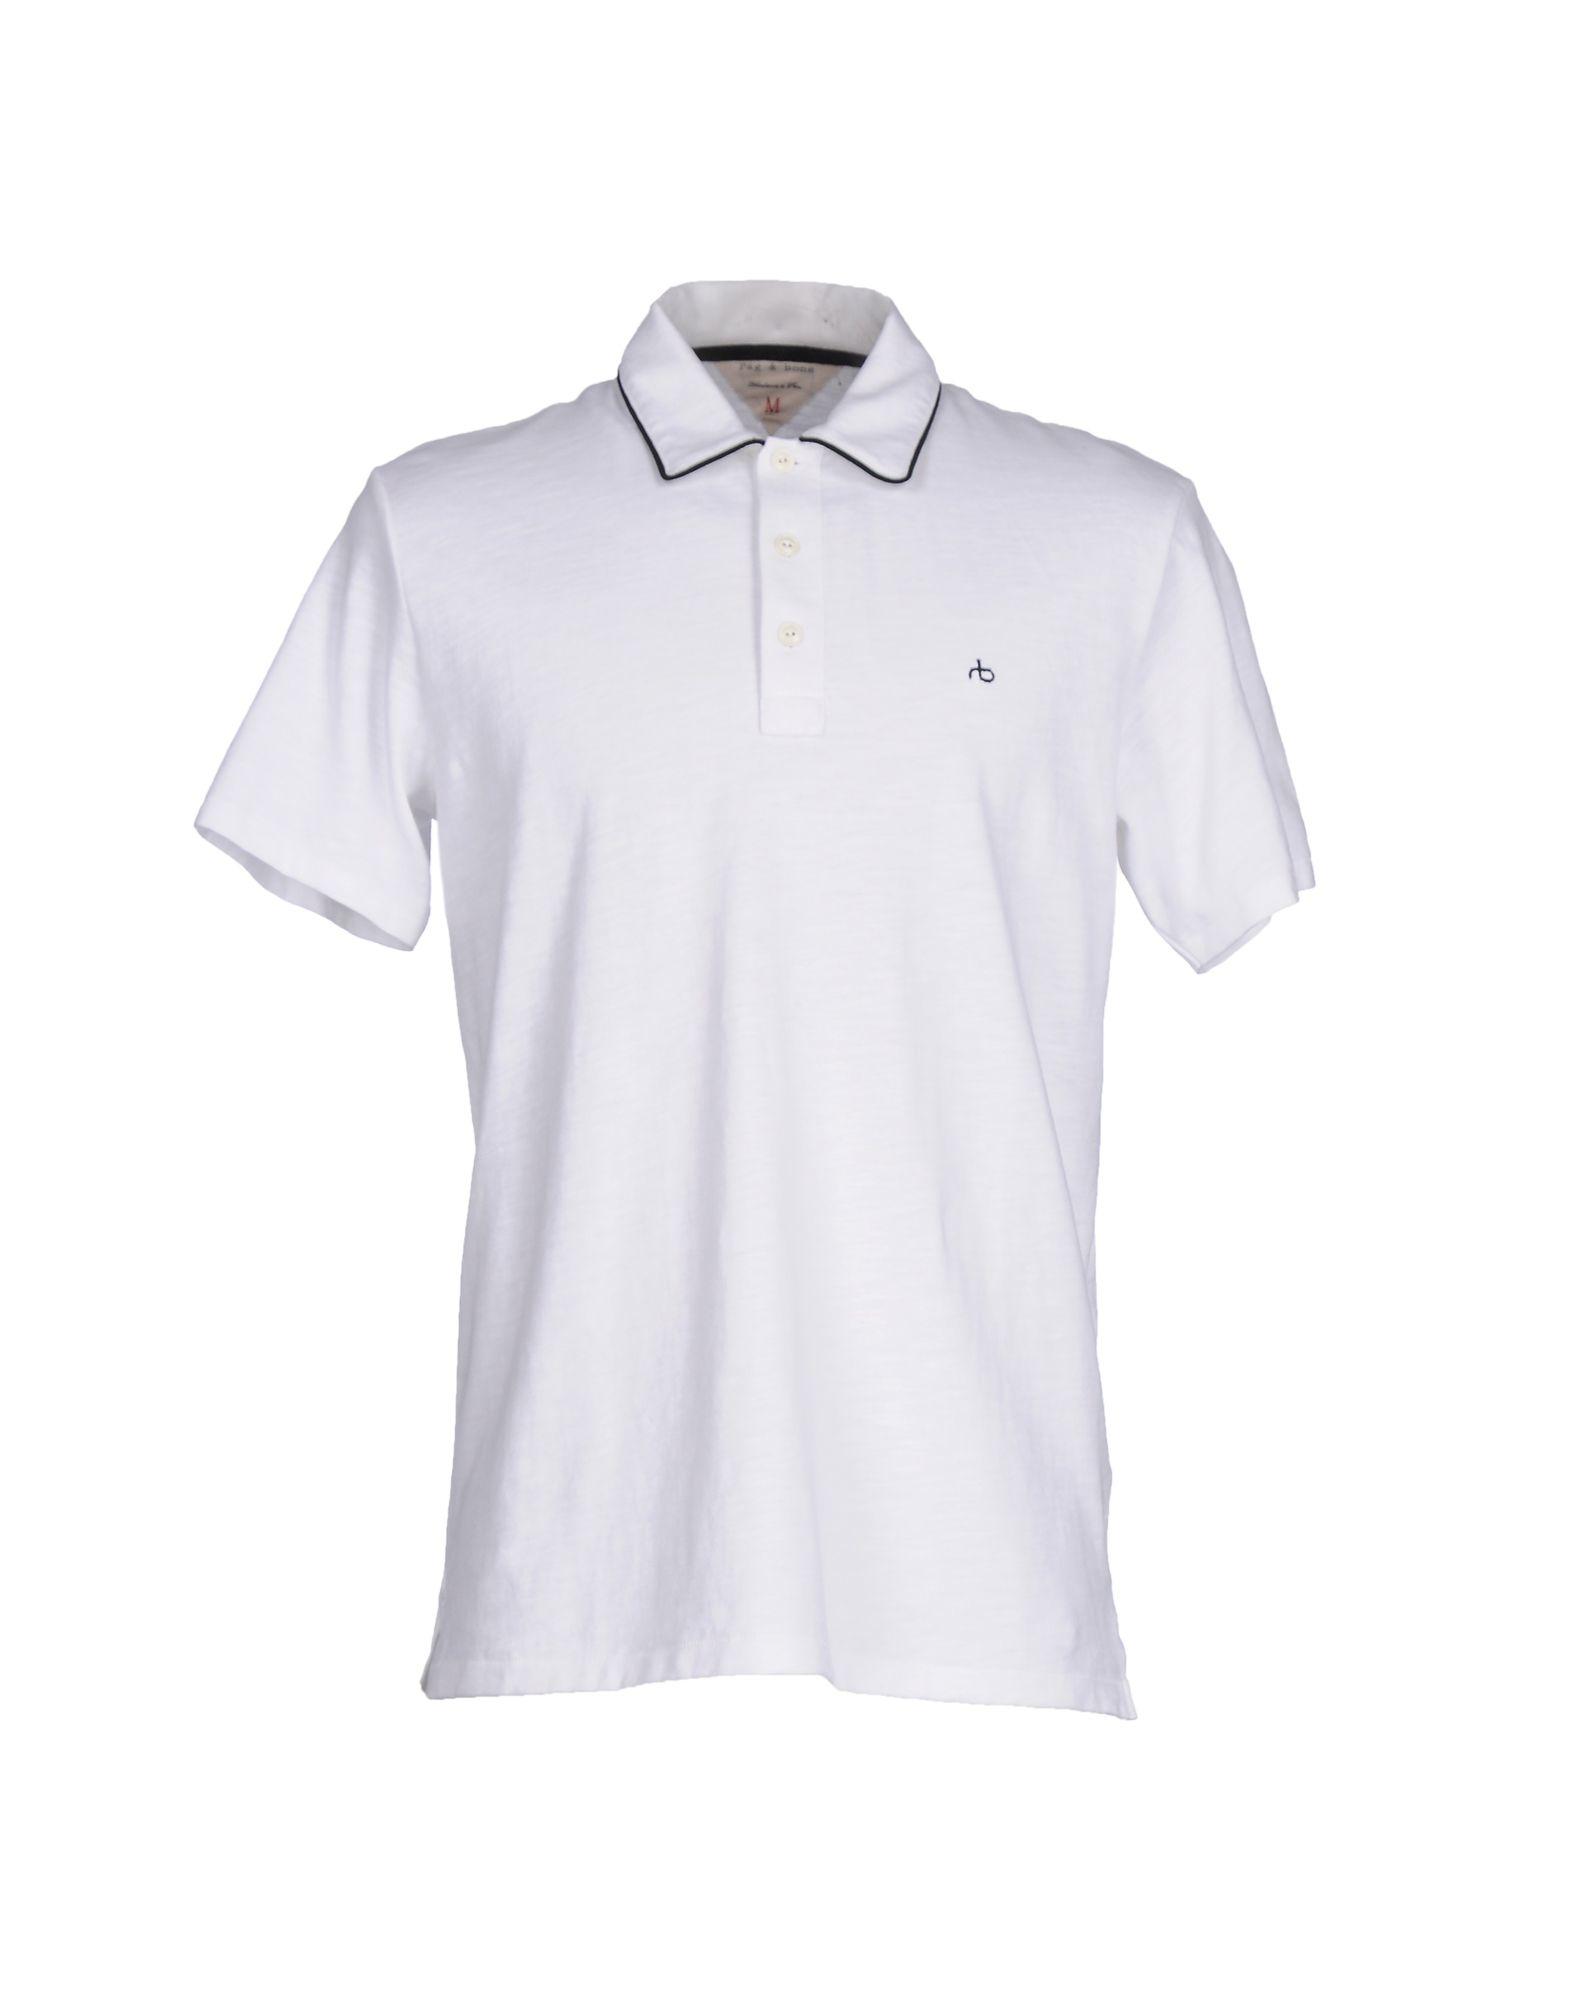 Rag bone polo shirt in white for men lyst for Rag and bone t shirts